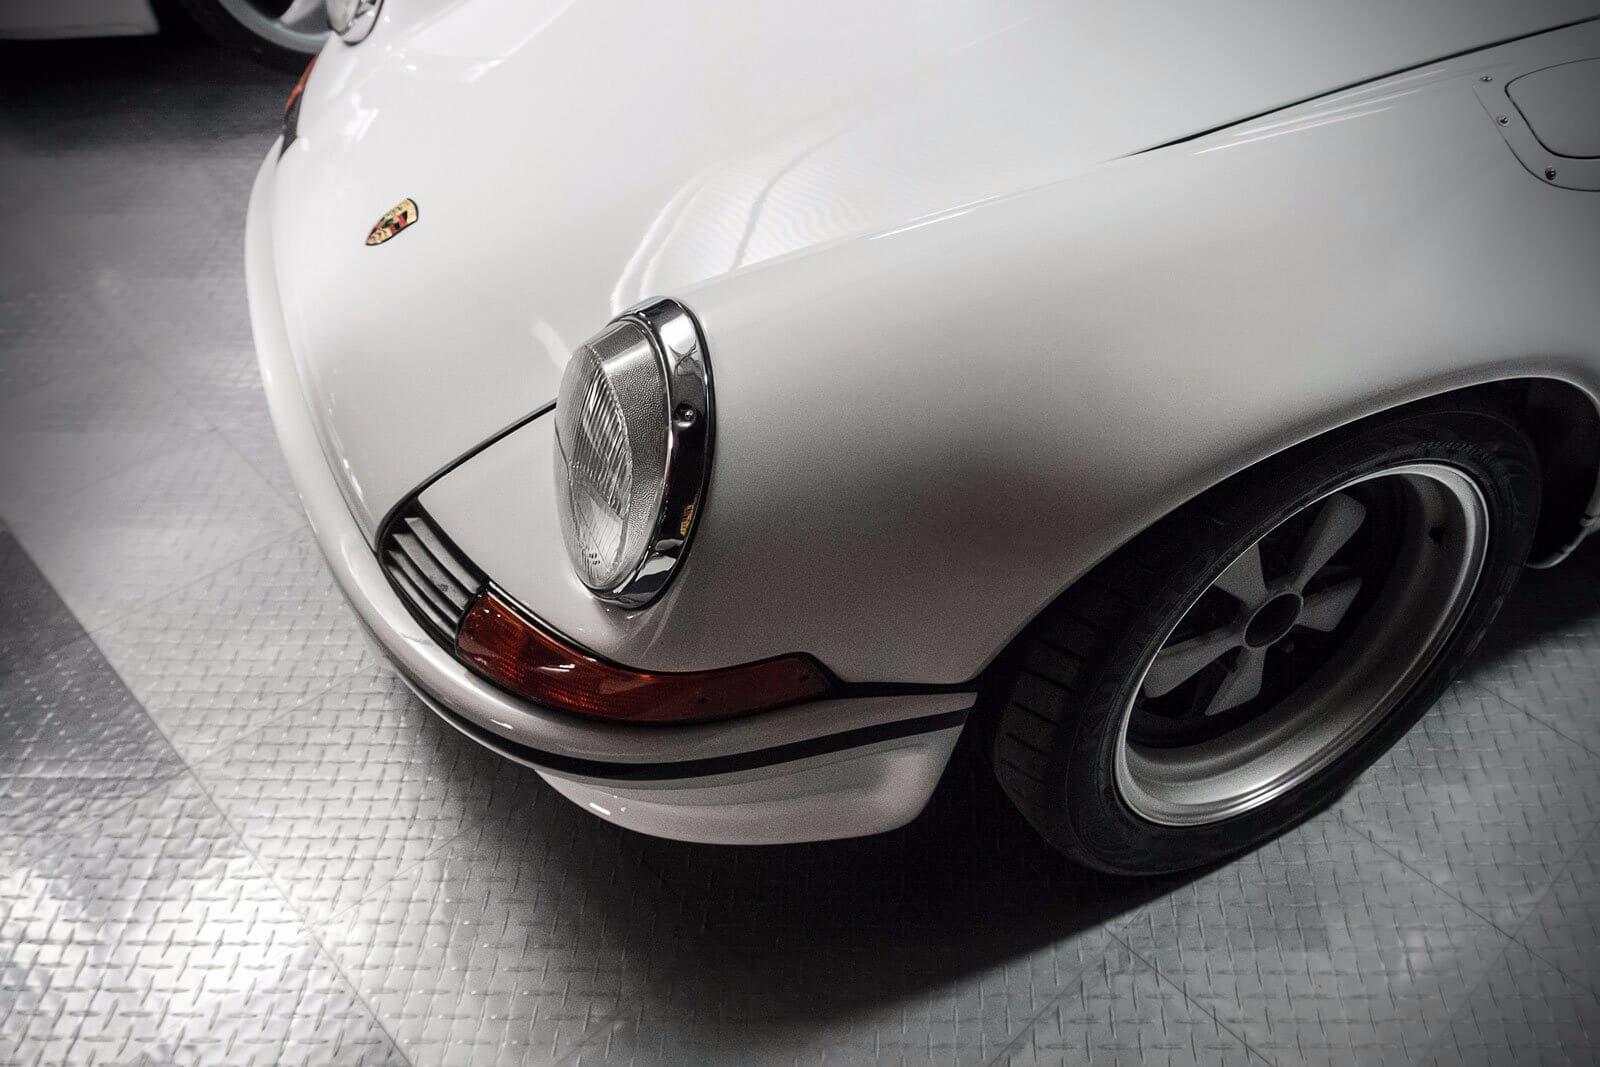 Vintage Porsche on RaceDeck Diamond